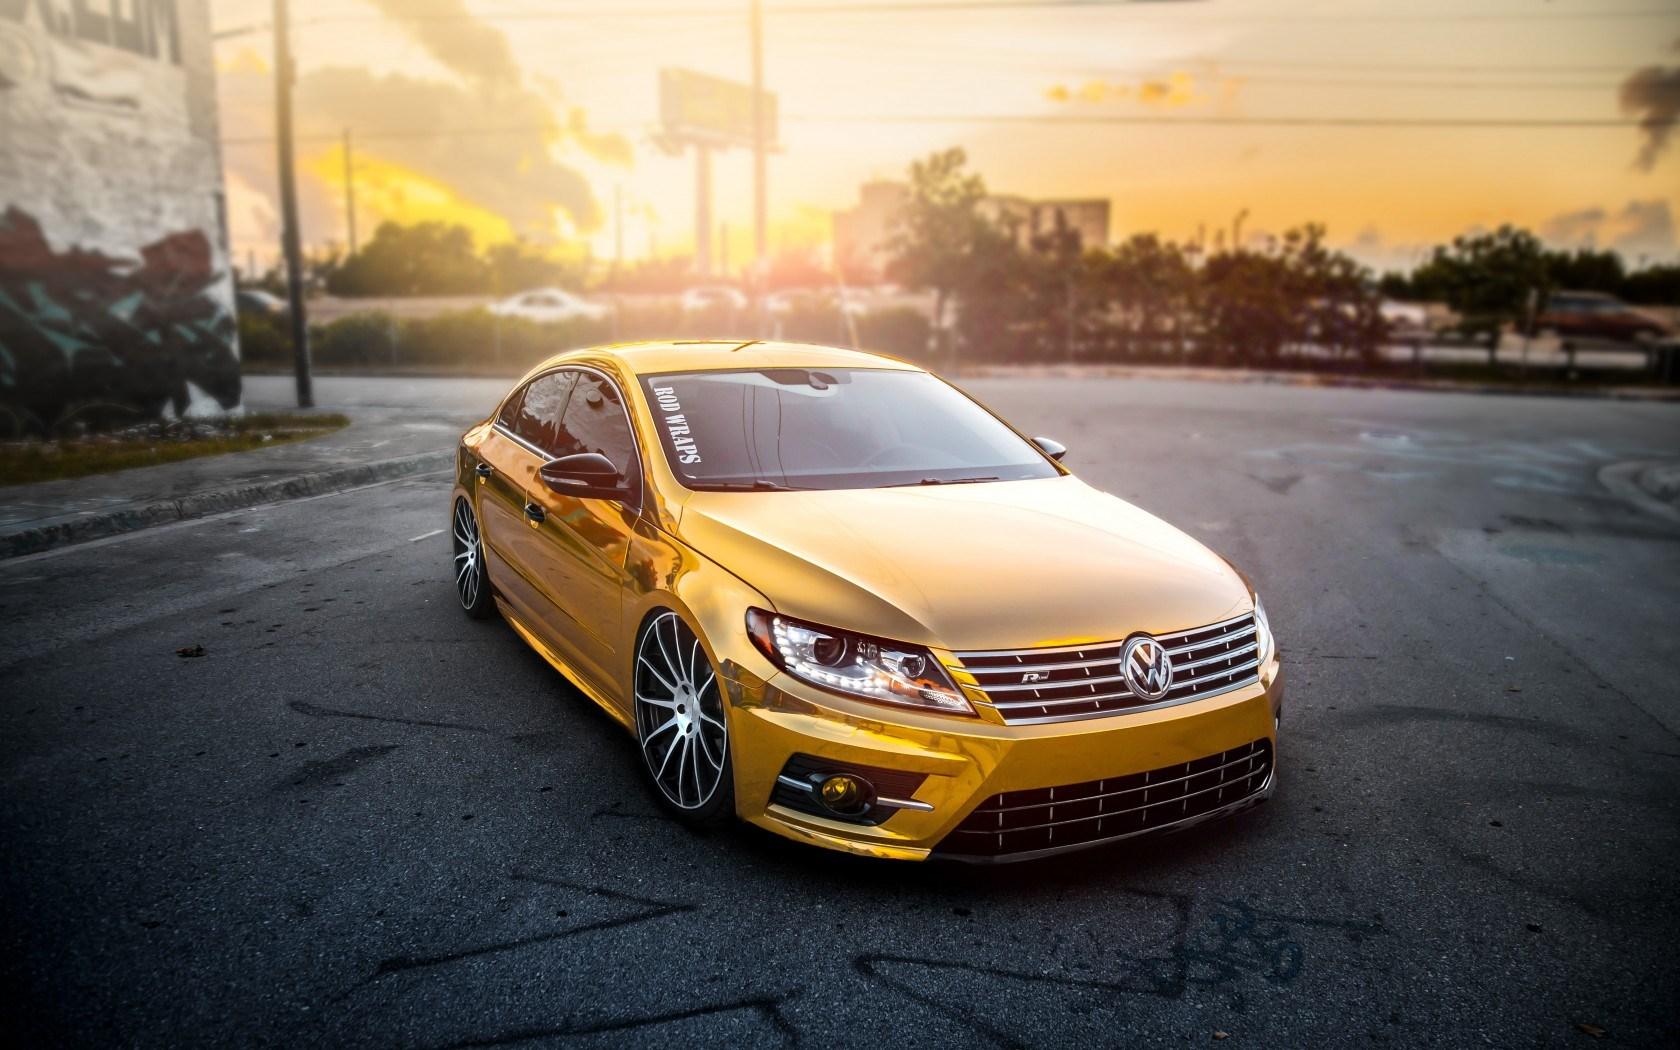 Volkswagen Passat CC Tuning Gold Car